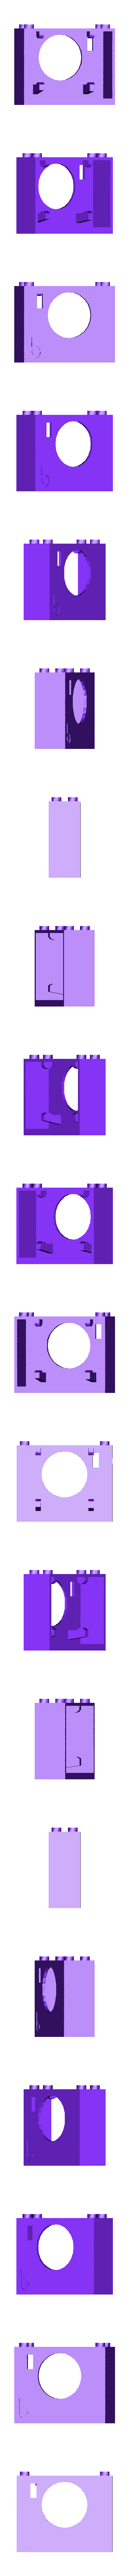 bb624PIRPLX.stl Télécharger fichier STL gratuit badBrick bb624PIRPLX Parallax PIR Sensor Brick Mount. • Design à imprimer en 3D, Lassaalk